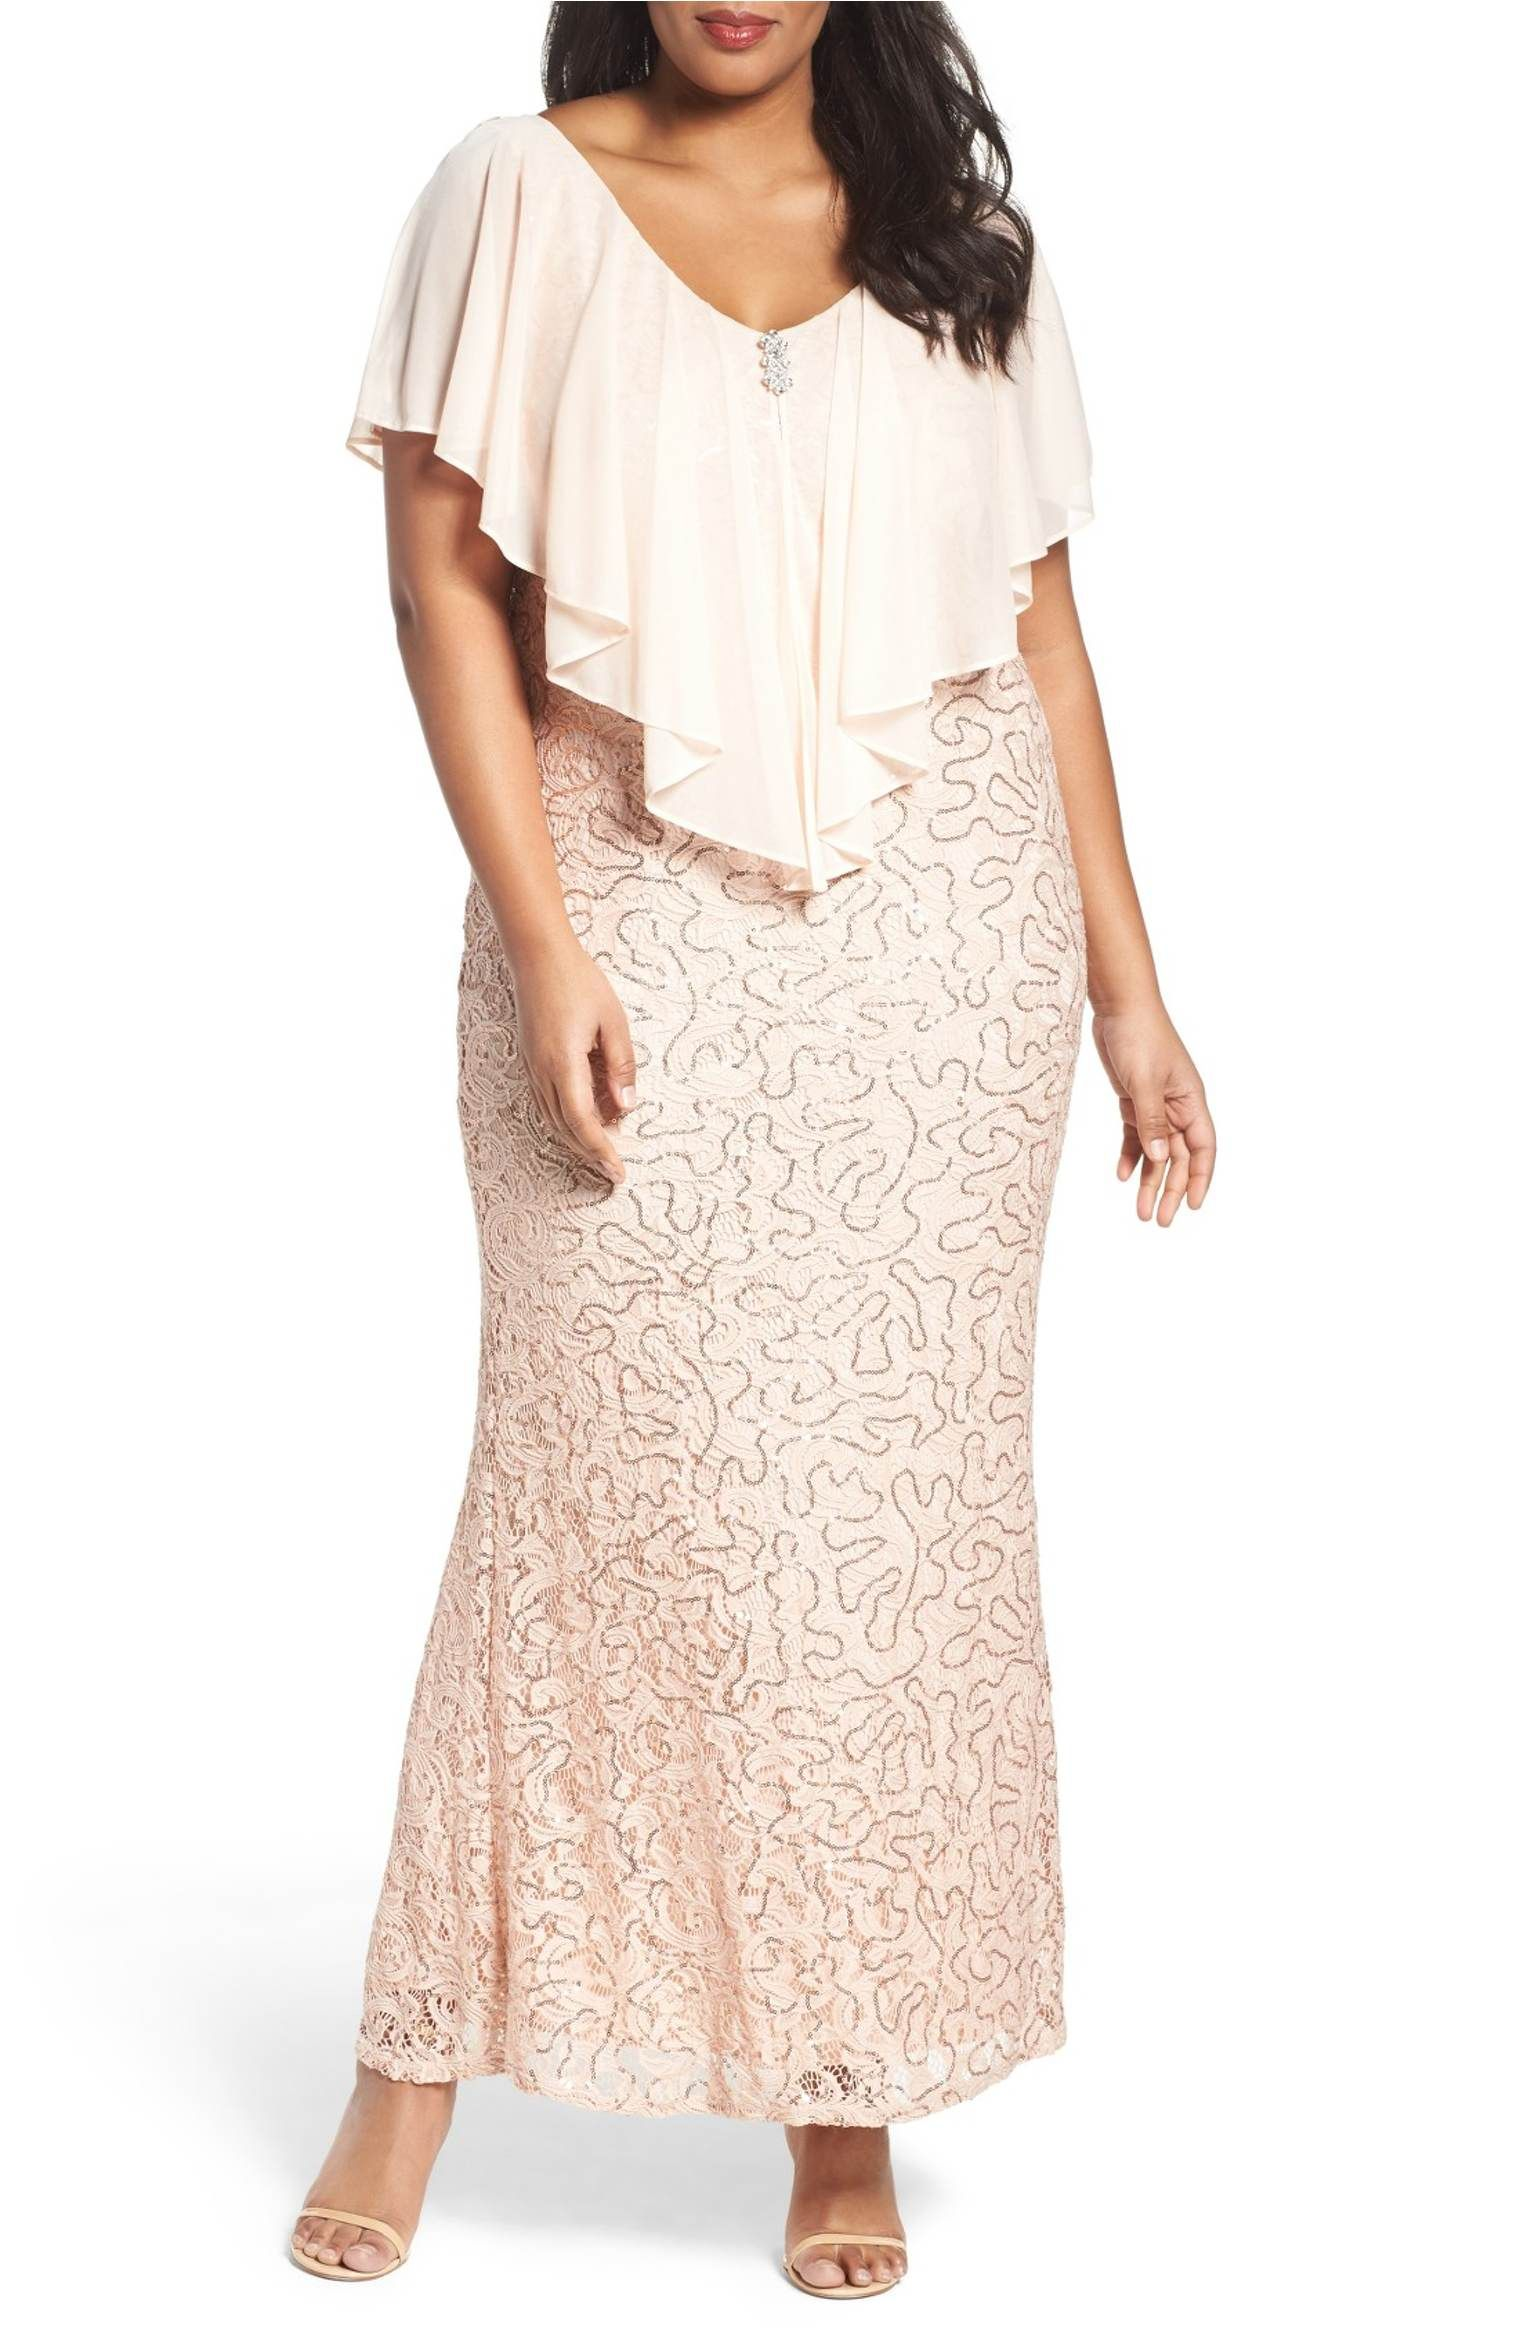 9a8072c6e0b1 Main Image - Marina Chiffon Capelet Sequin Lace Gown (Plus Size ...